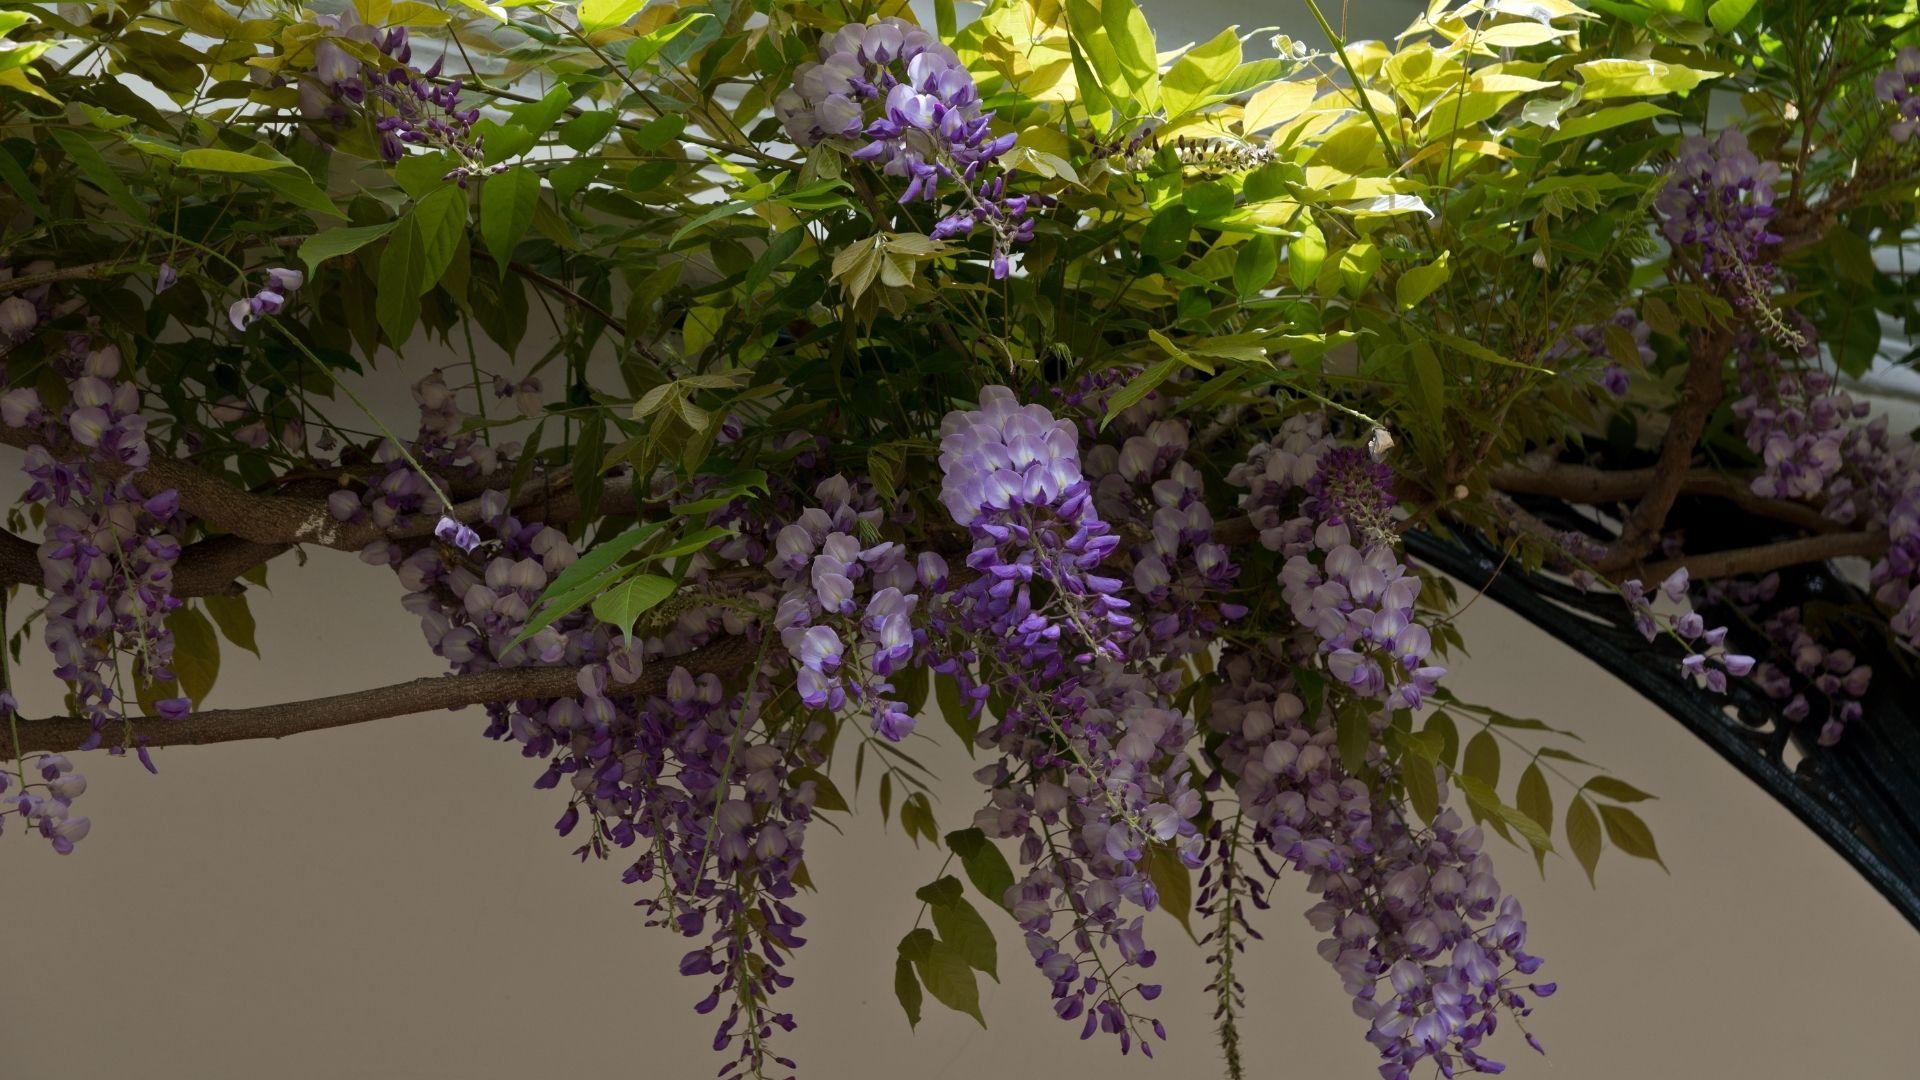 Wisteria Vine With Purple Flowers.